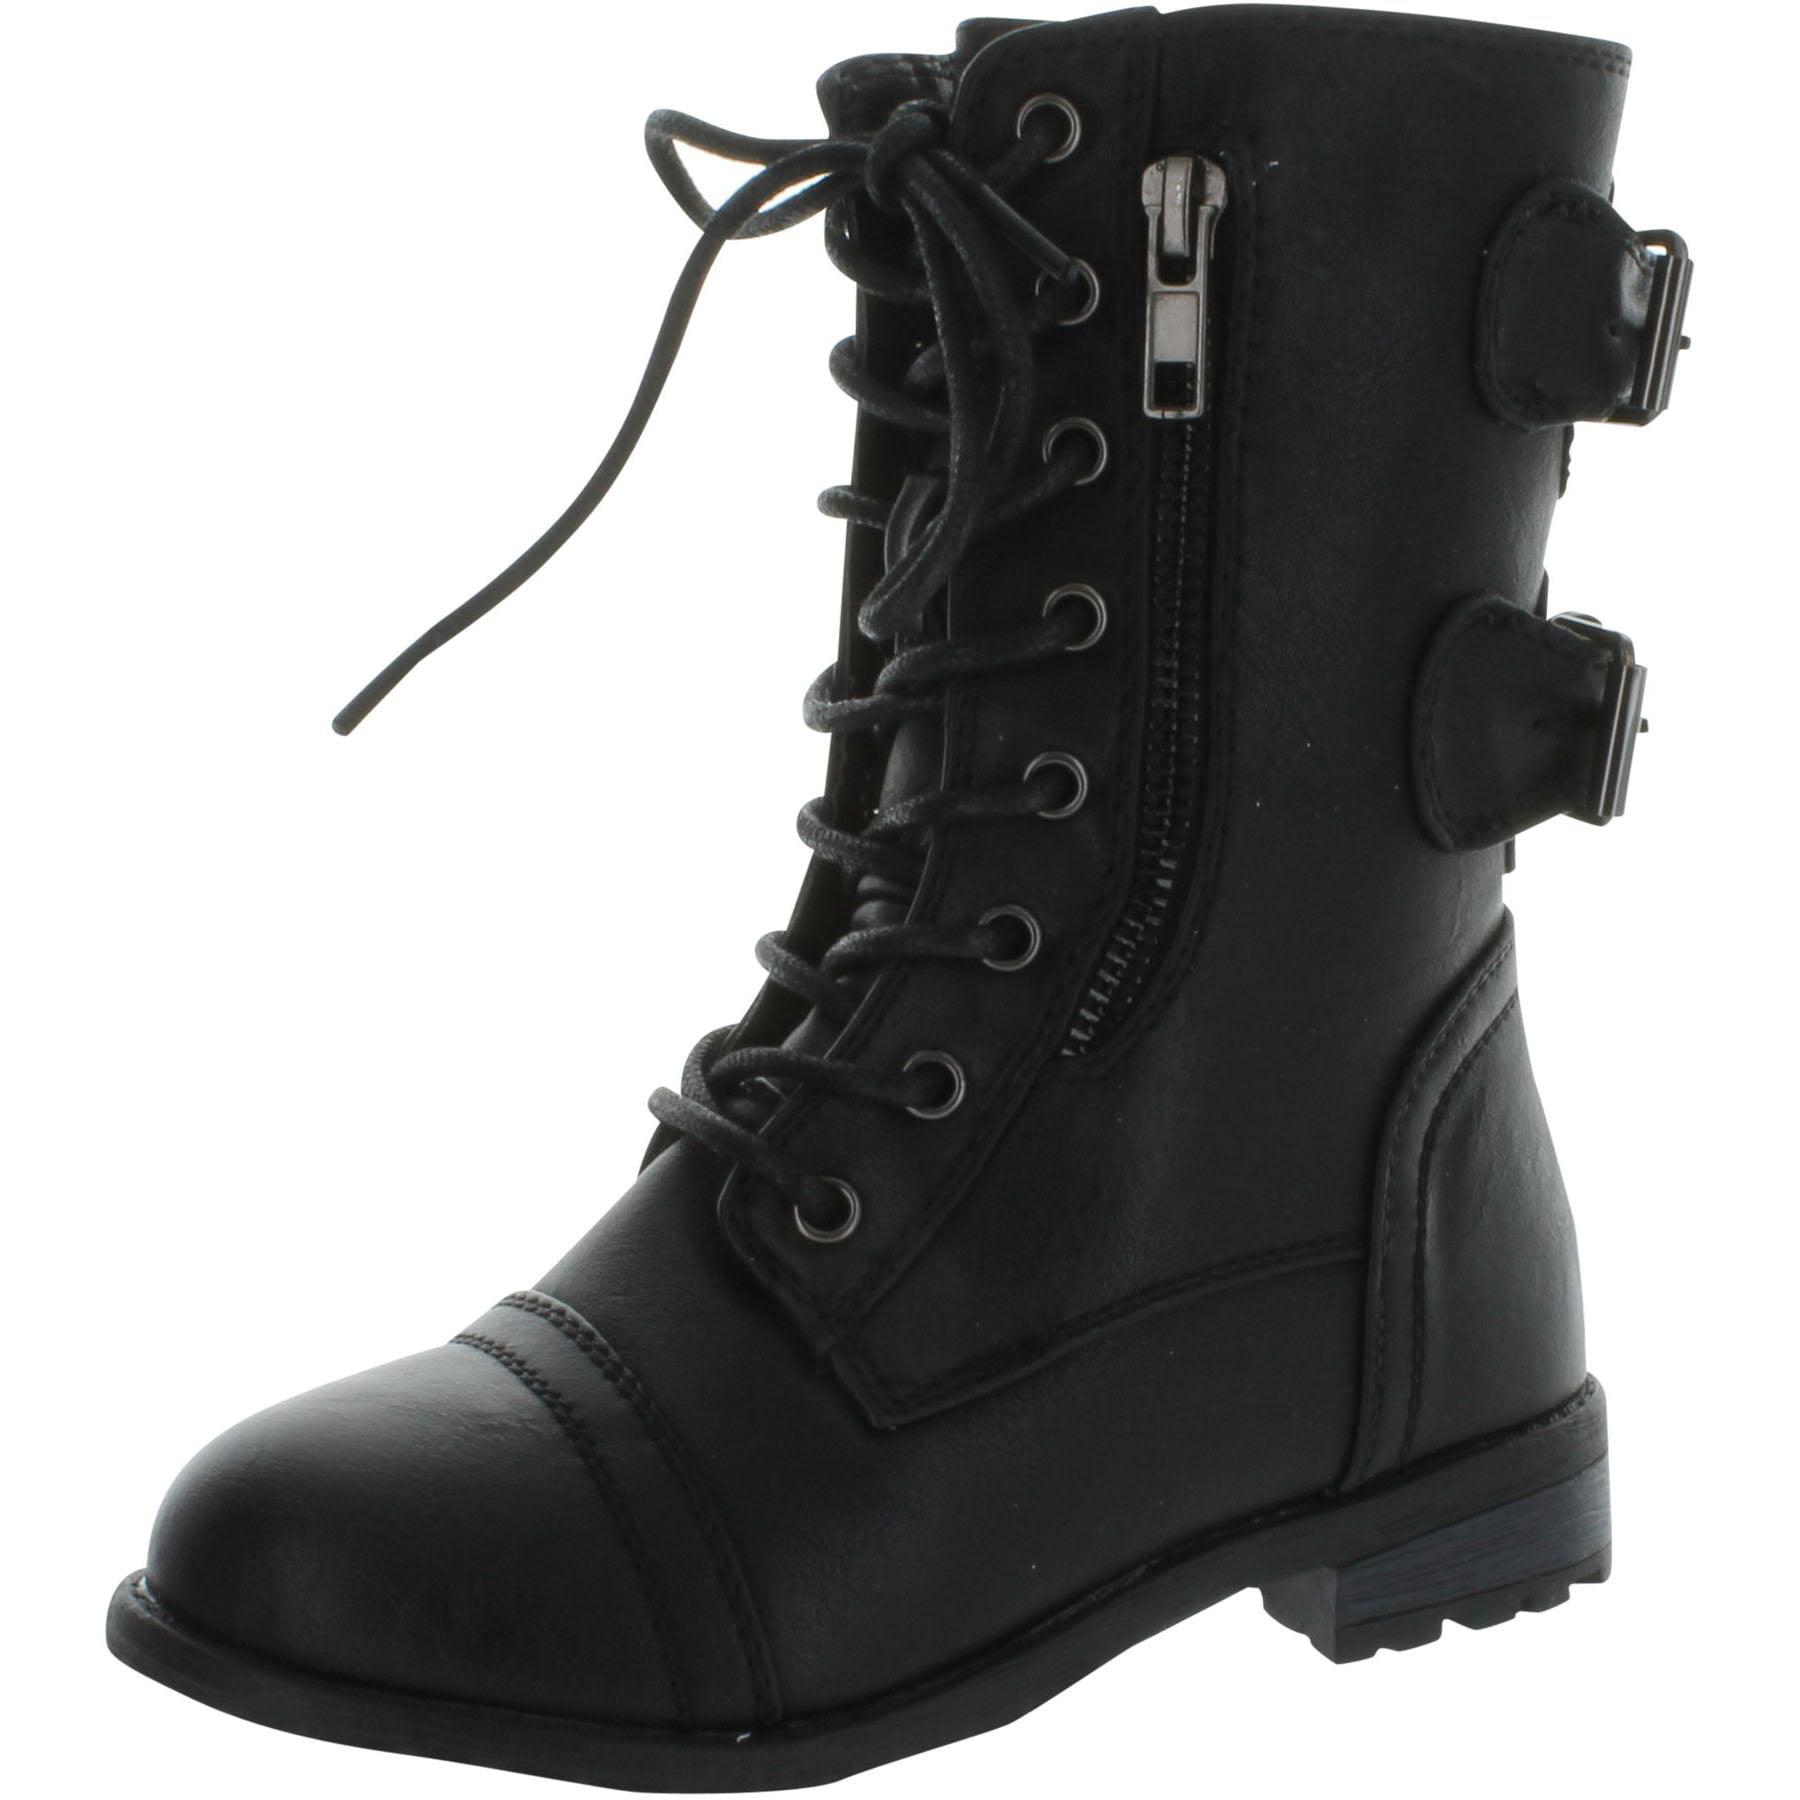 Black Girls Lace-Up Boots - Walmart.com